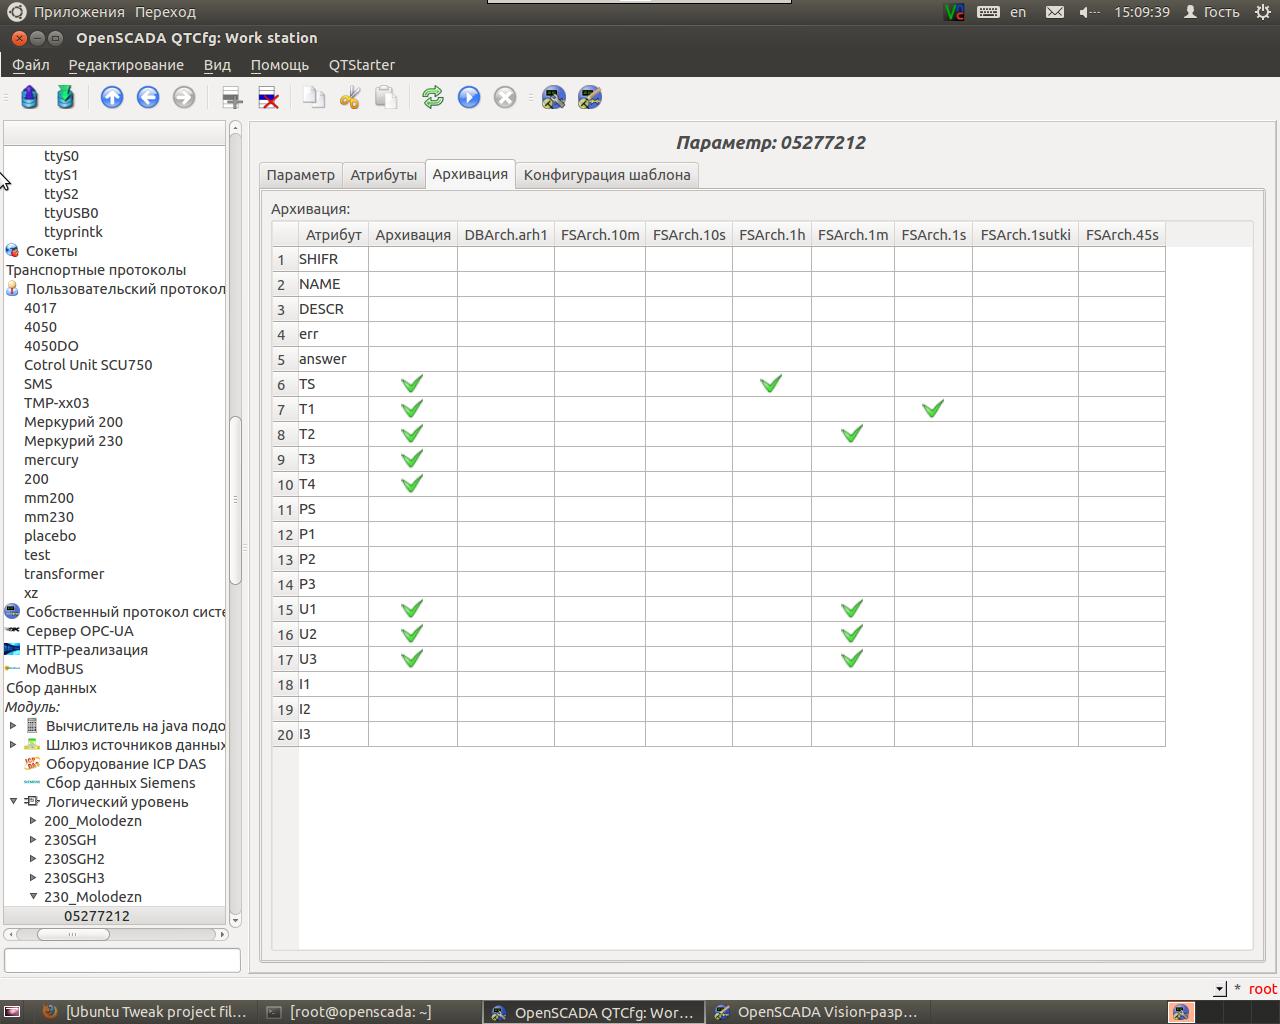 Пишем протоколы счетчиков Меркурий 230 и Меркурий 200 для OpenSCADA - 10